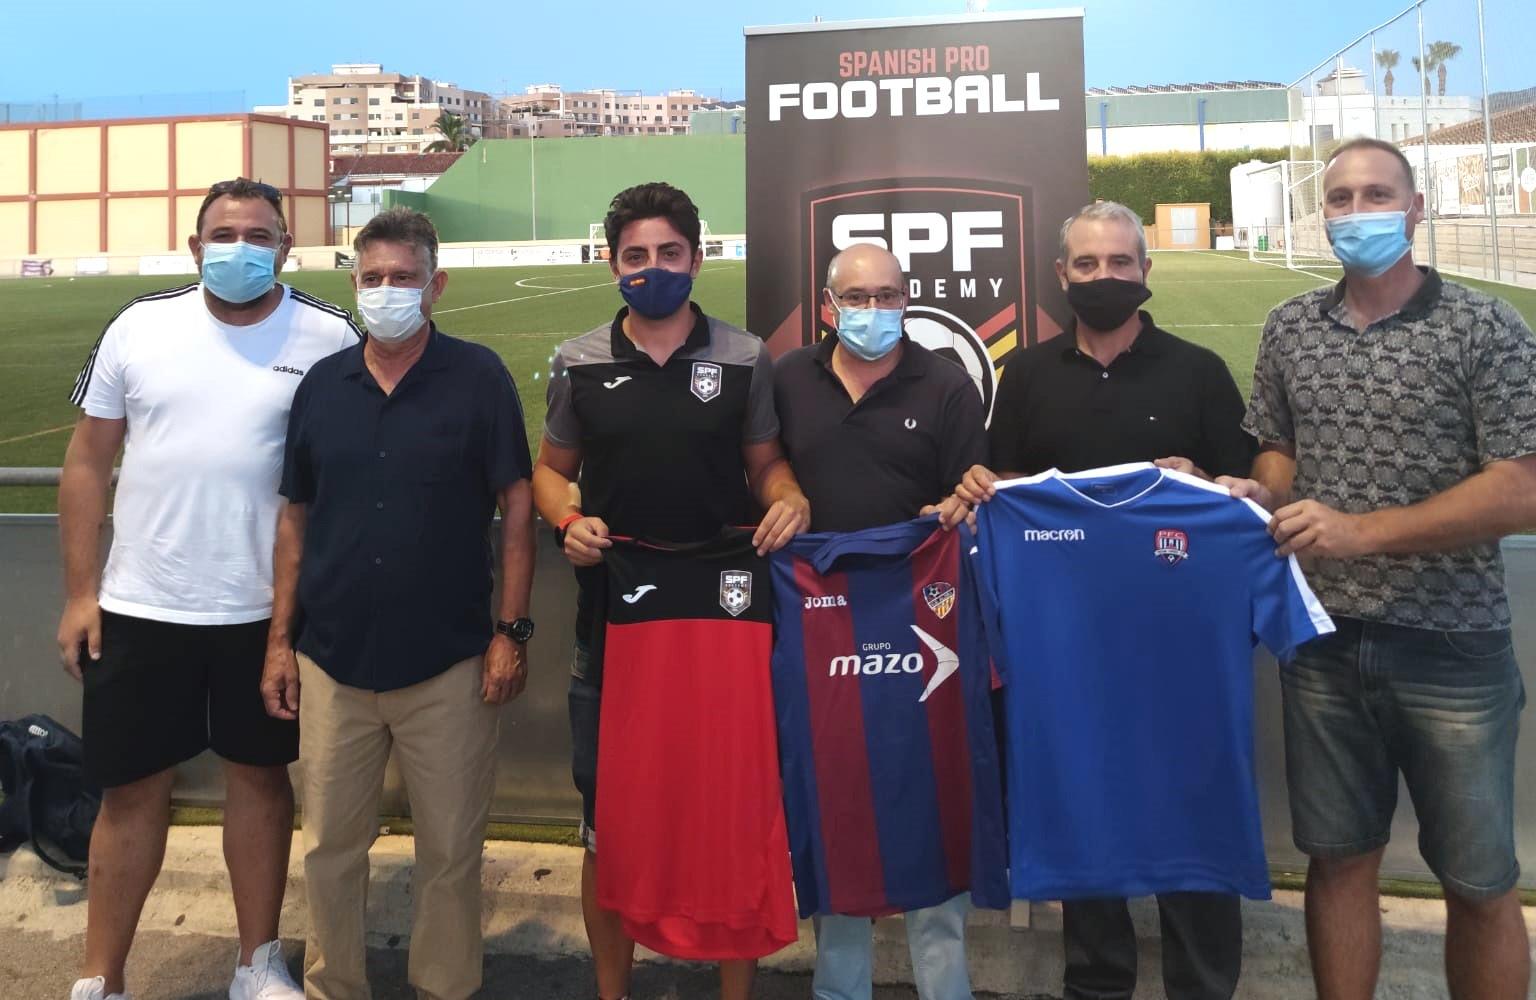 Spanish ProFootball - Alzira Radio notícies d'Alzira